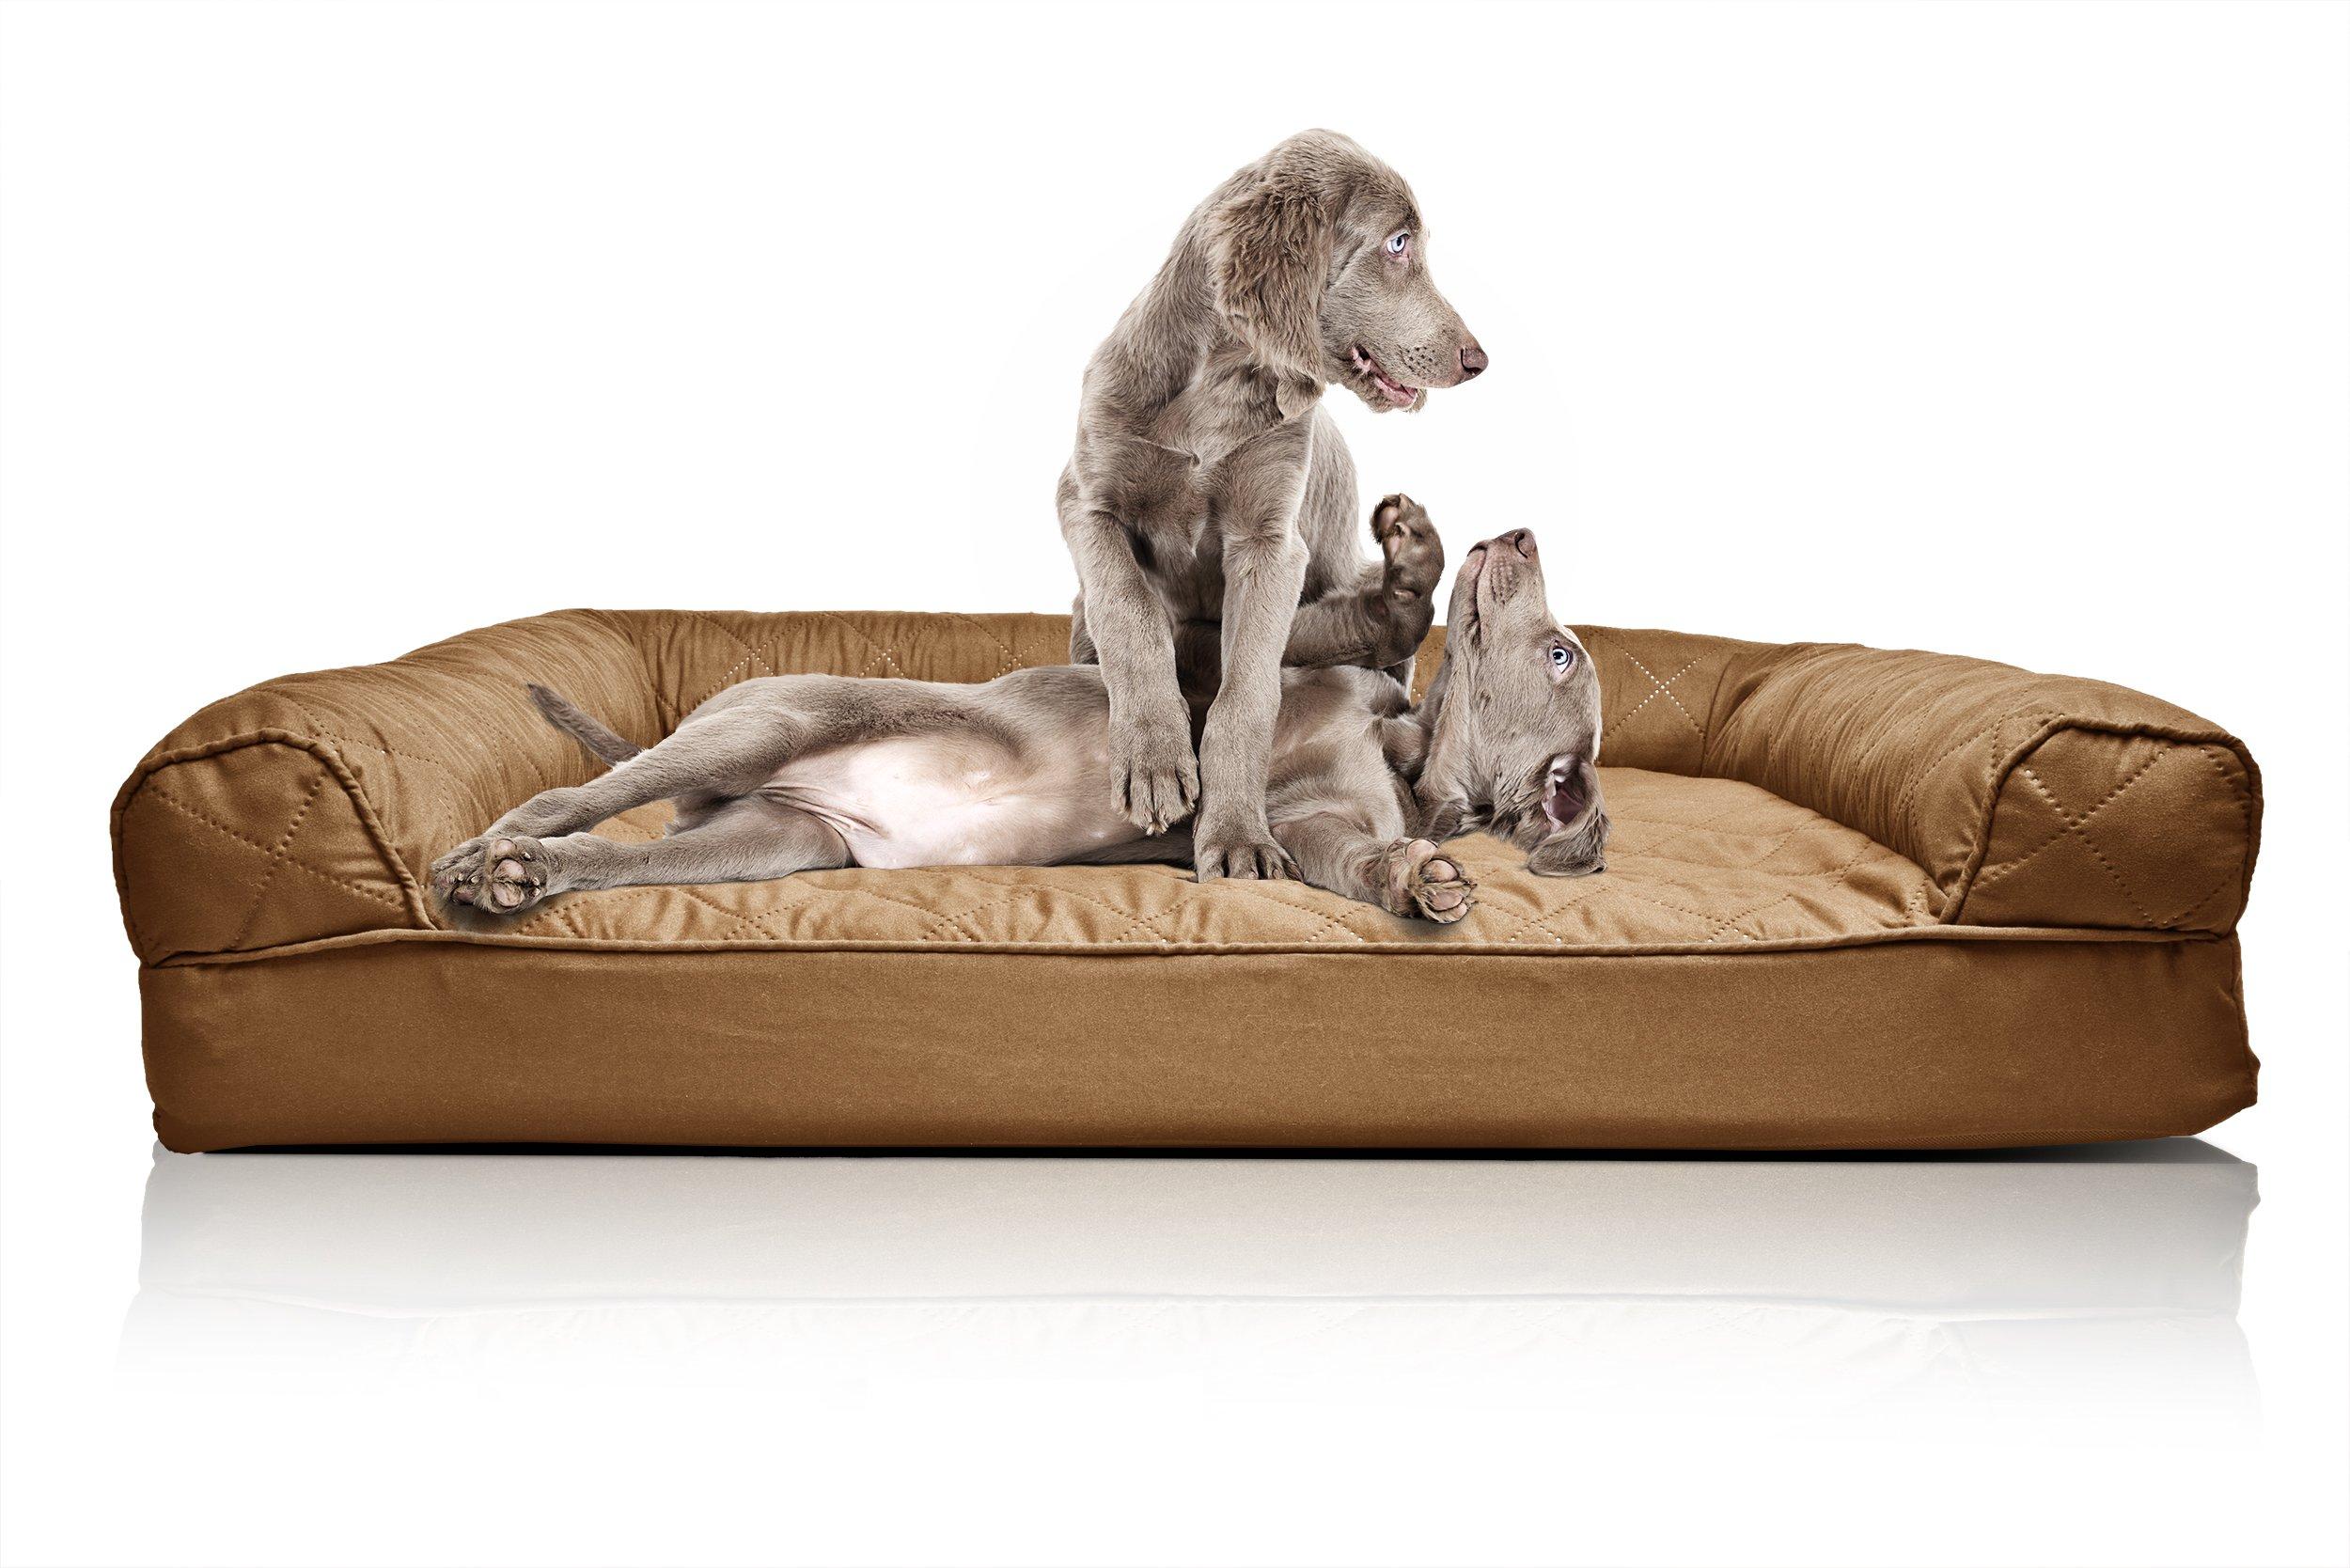 FurHaven Orthopedic Dog Sofa Bed Pet Bed Warm Brown Jumbo